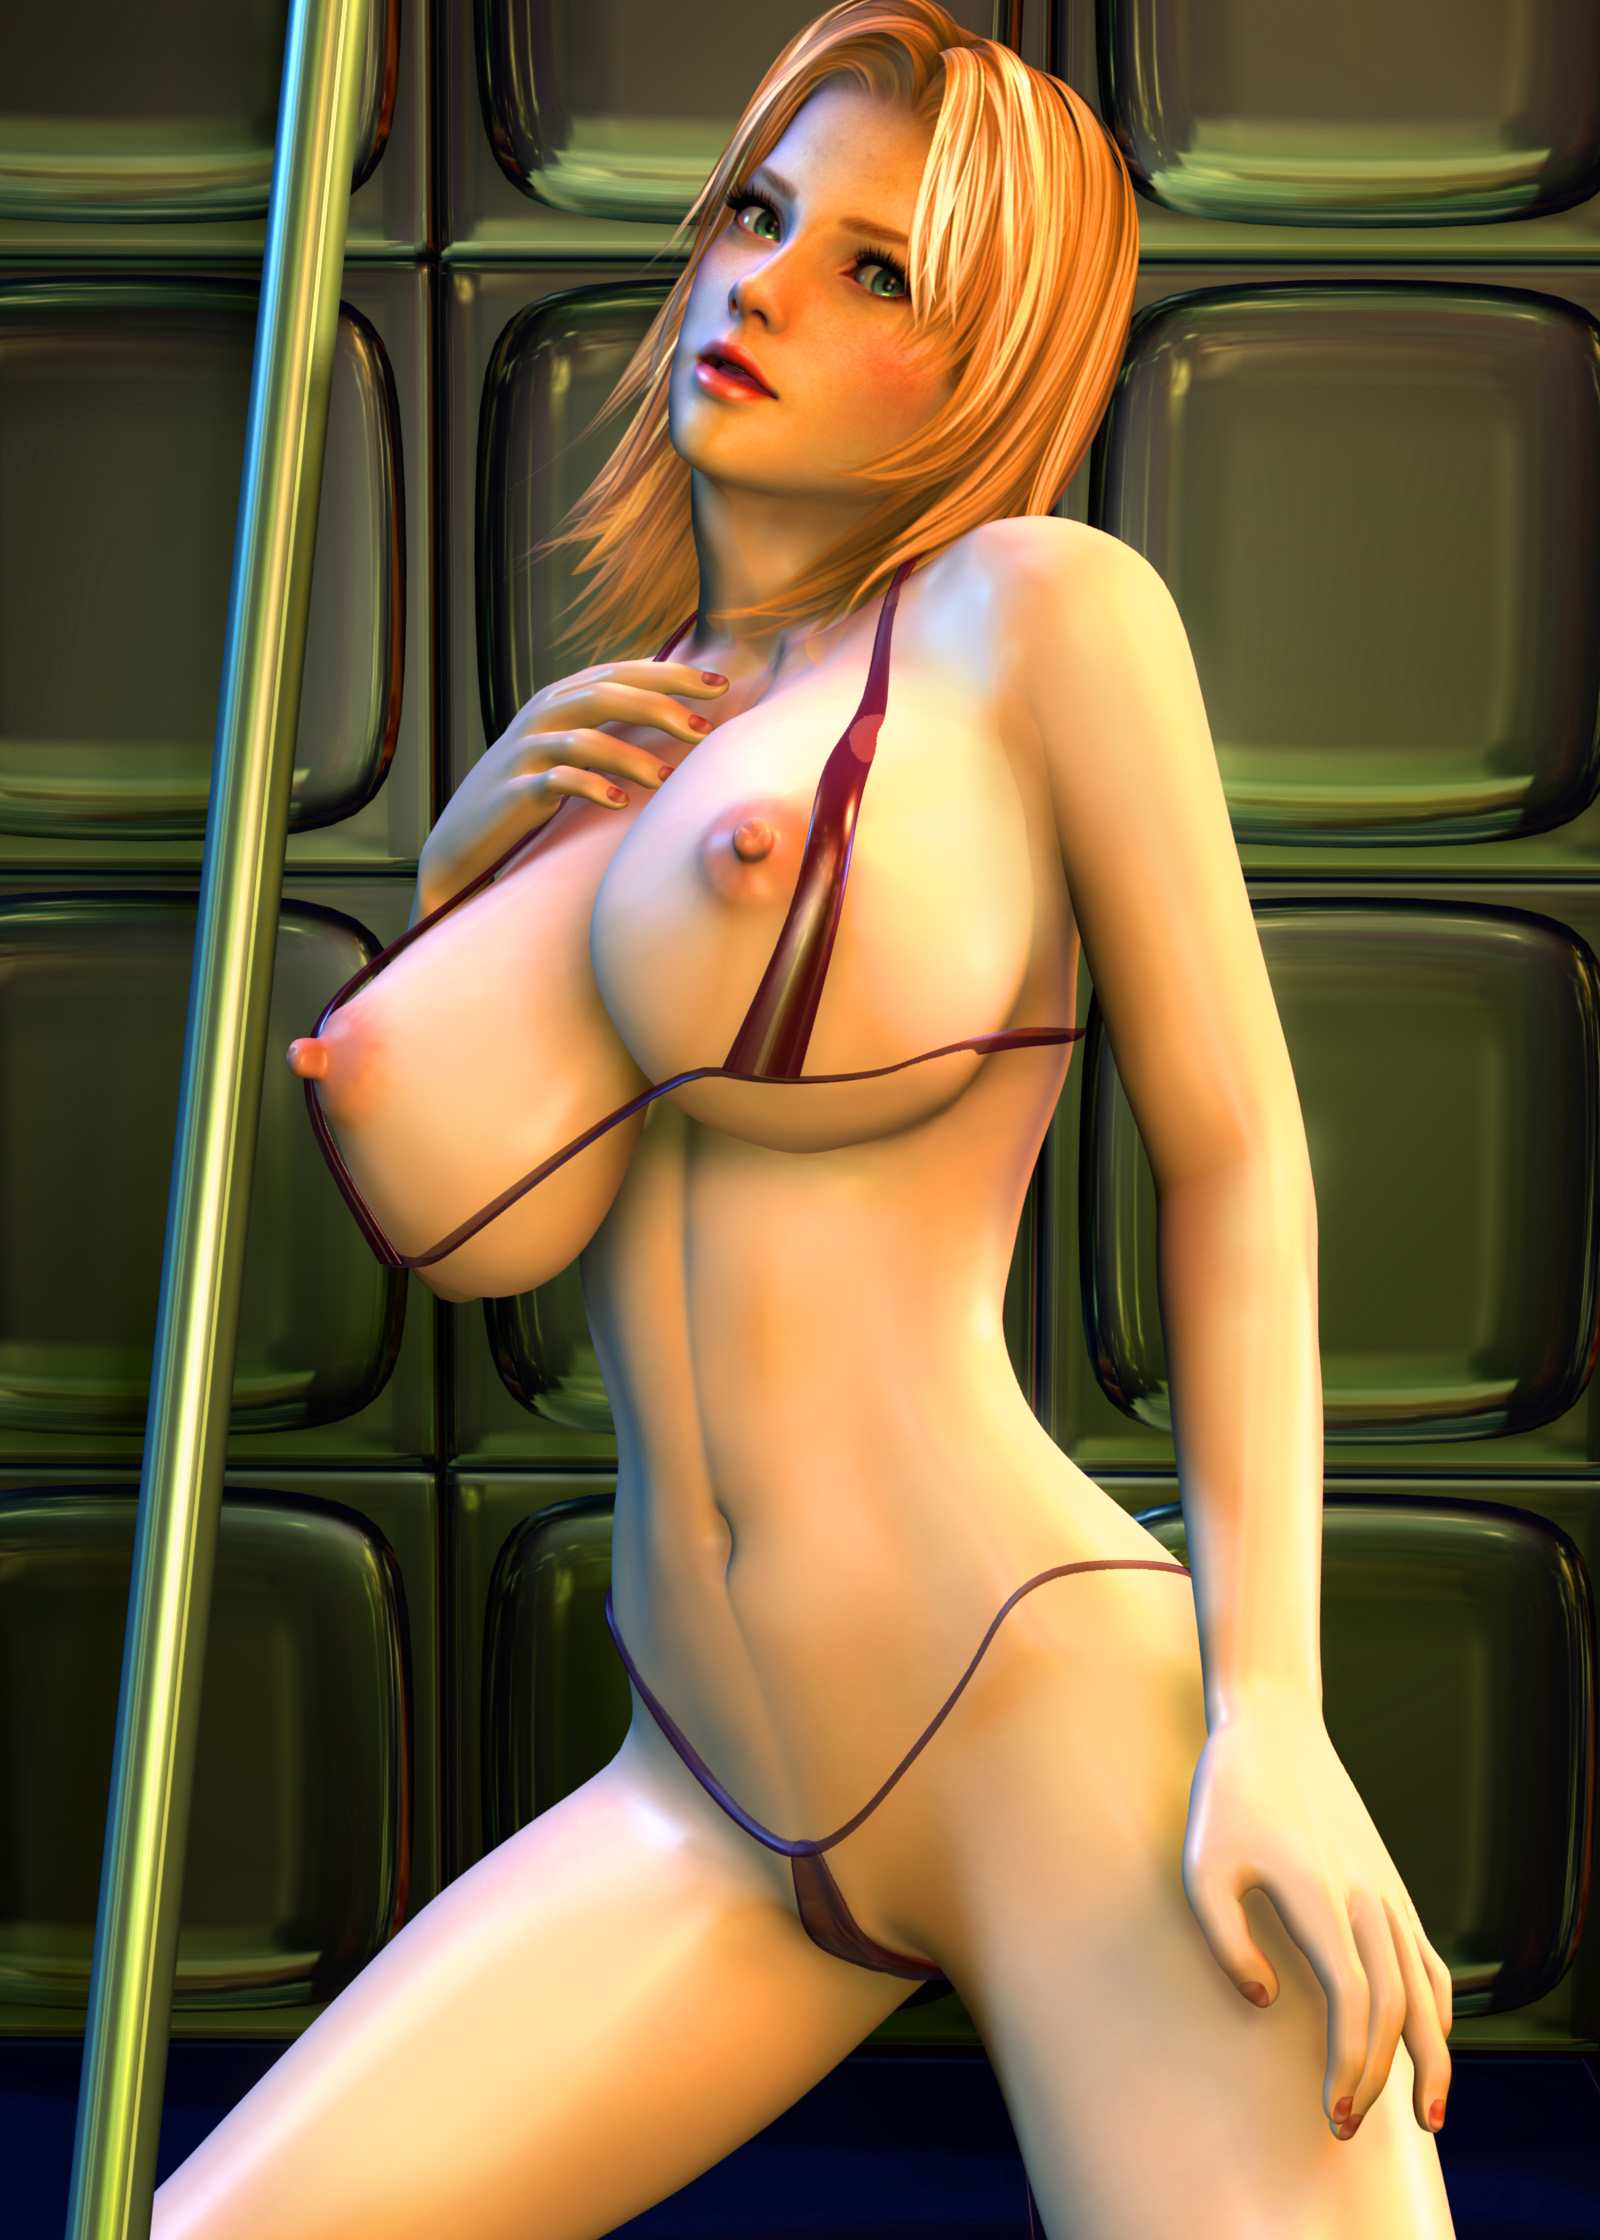 Tomb raider porn images online pron vids